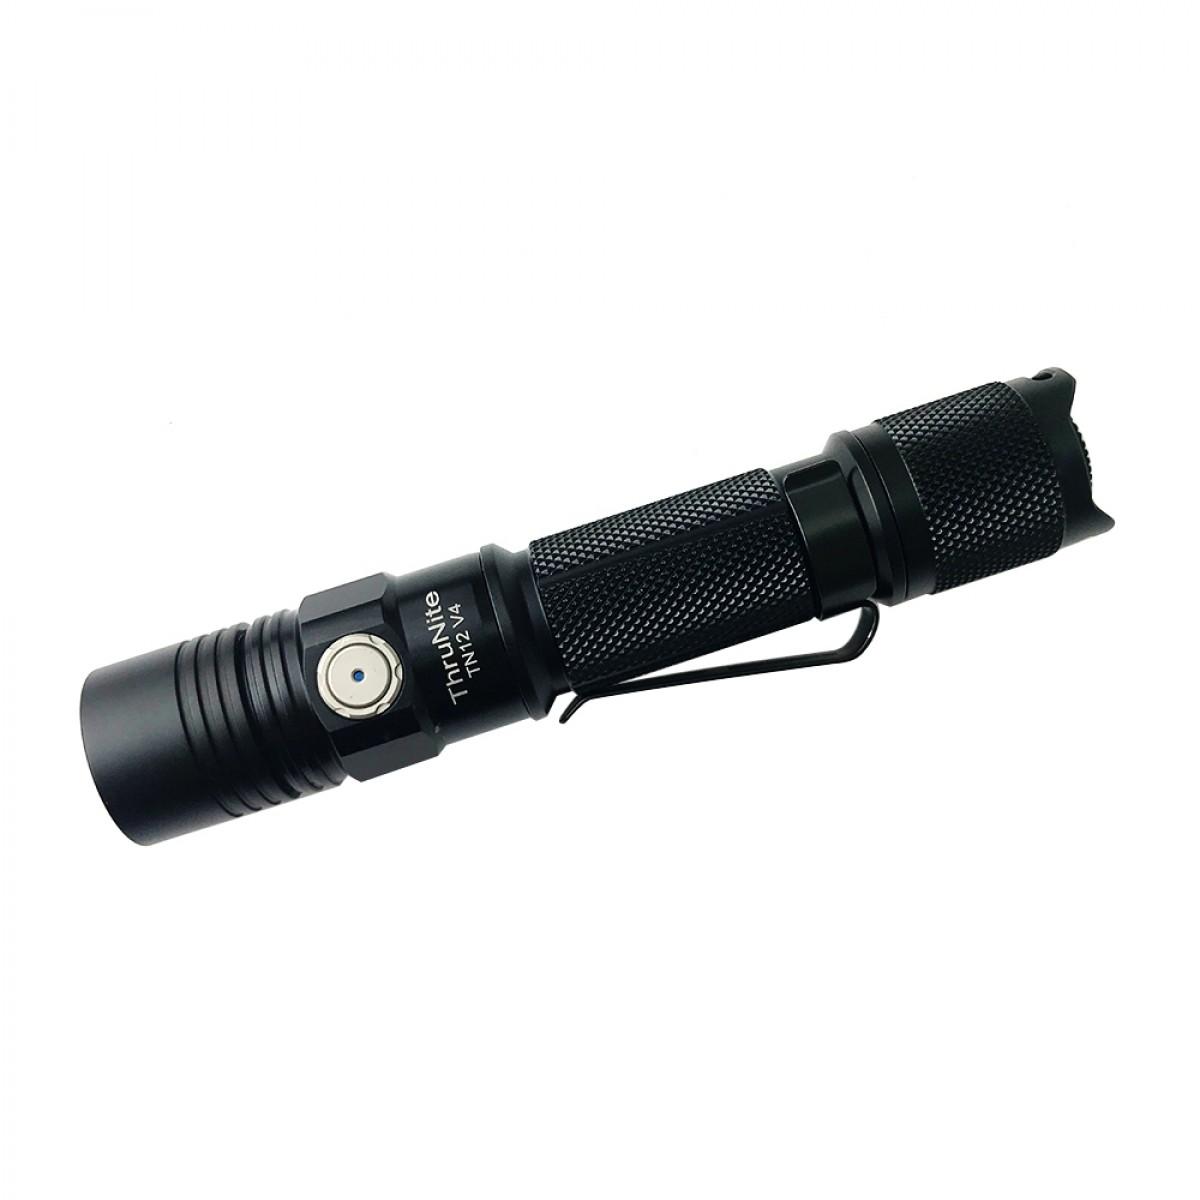 ThruNite TN12 V4 CREE XP-L V6 CW LED 1100L Flashlight